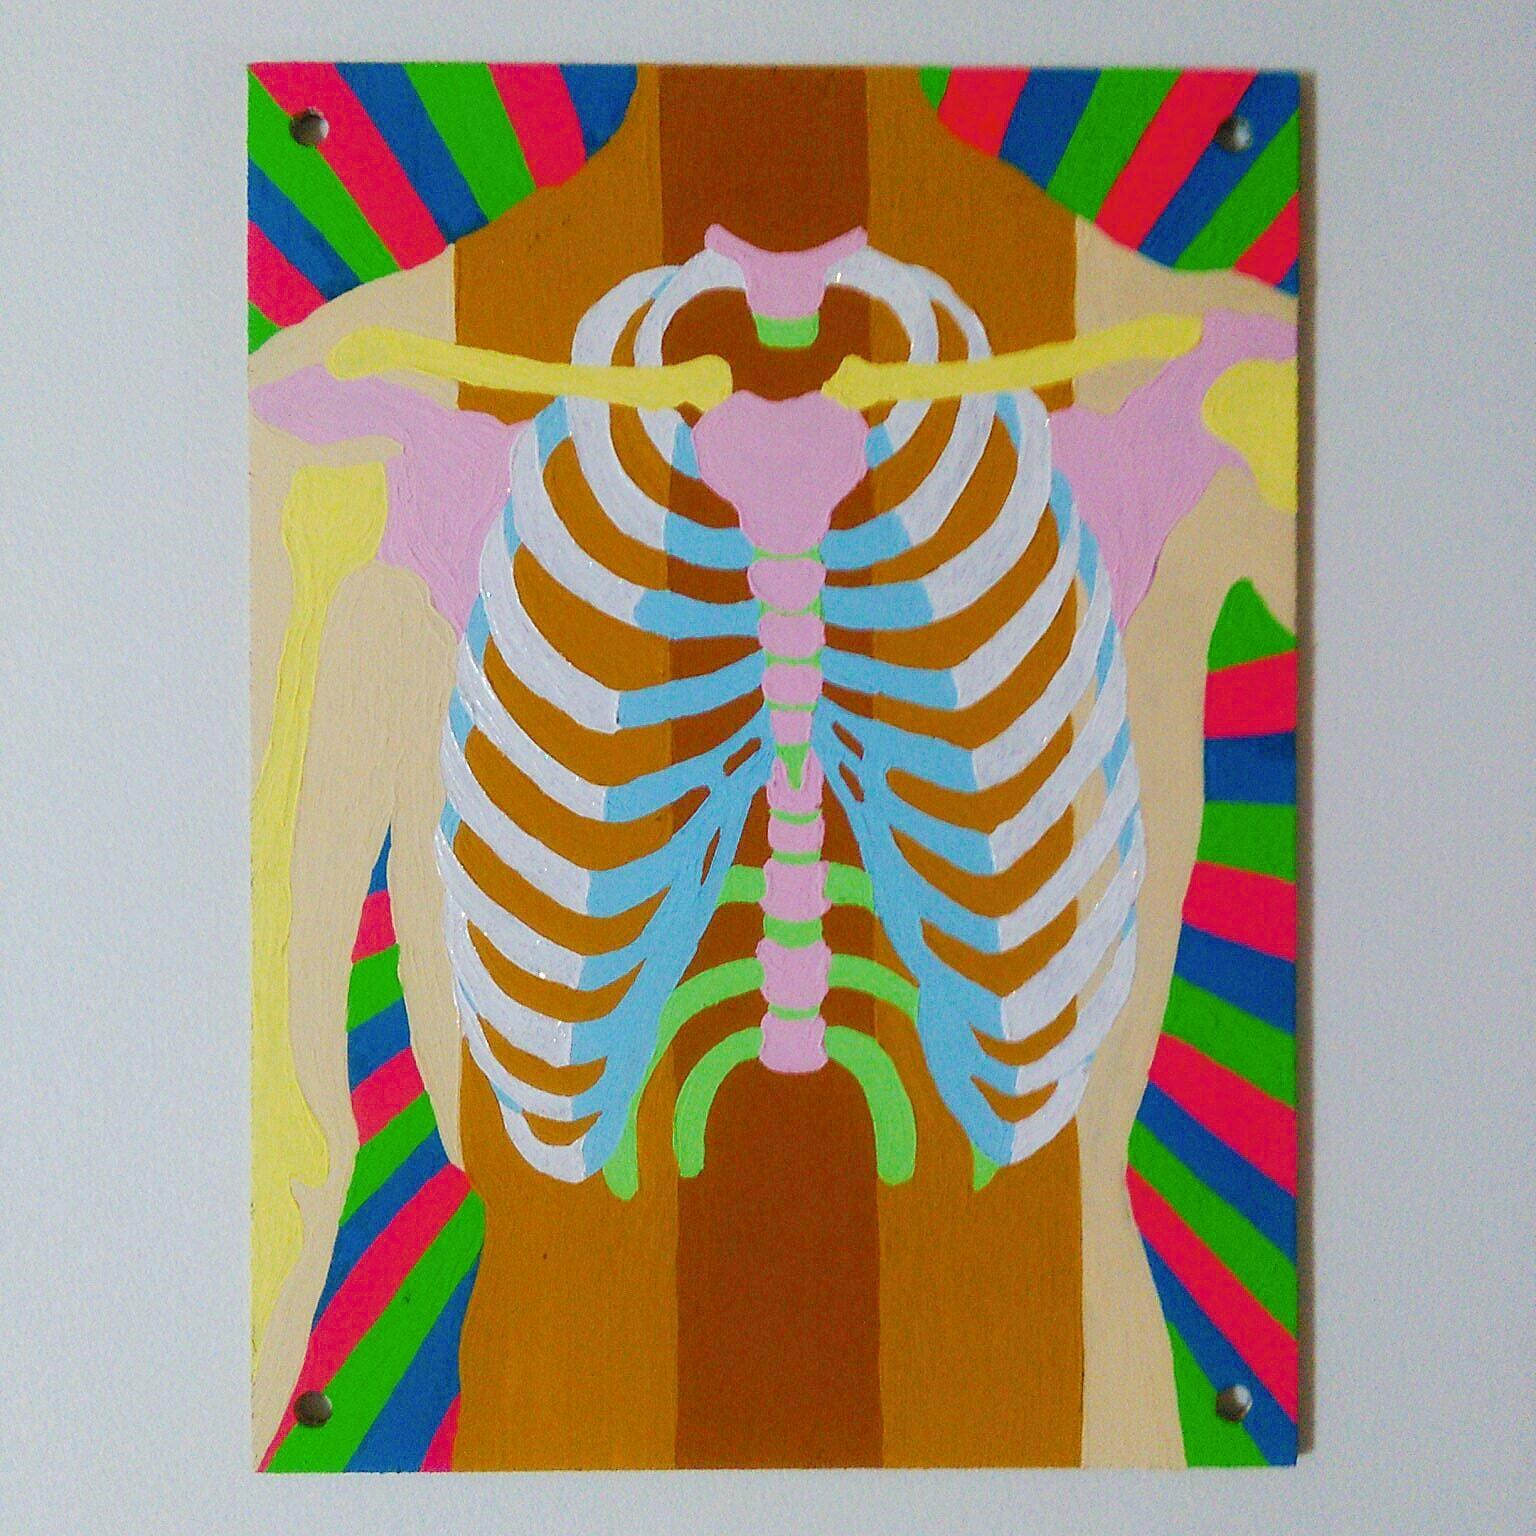 MUSCLE (2019) & BONES (2020) / 18cm×13.5cm / Acrylic painting / Original Drawing